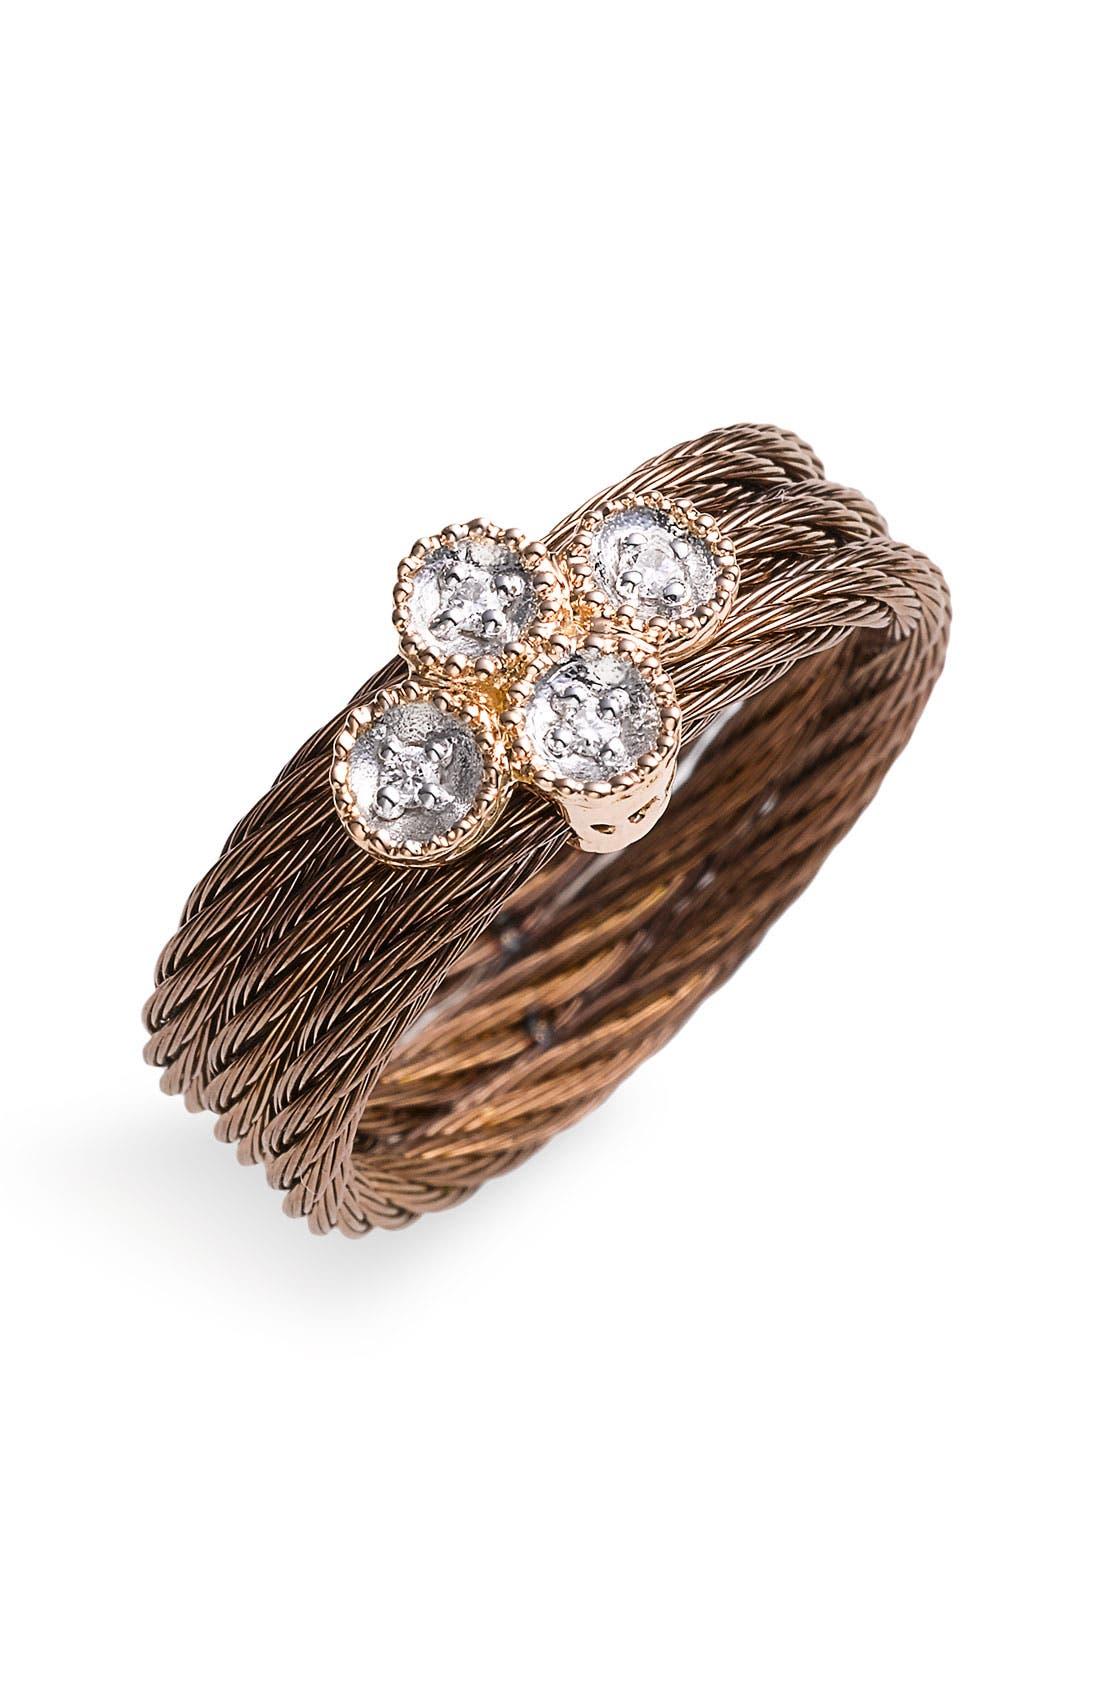 Main Image - ALOR® Gold, Diamond & Bronze Ring